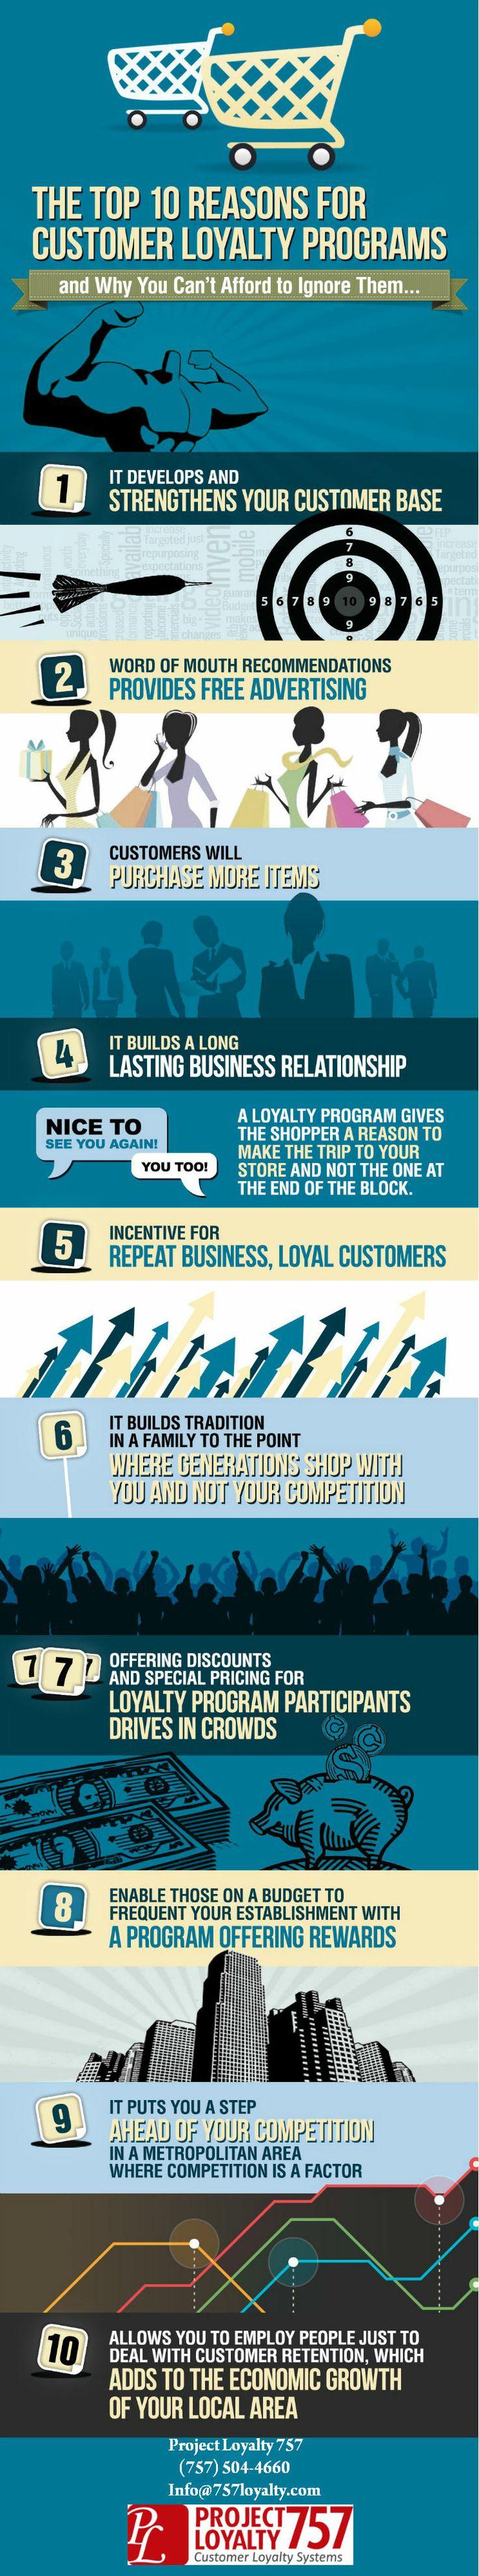 Best 25+ Customer loyalty programs ideas on Pinterest | Most ...